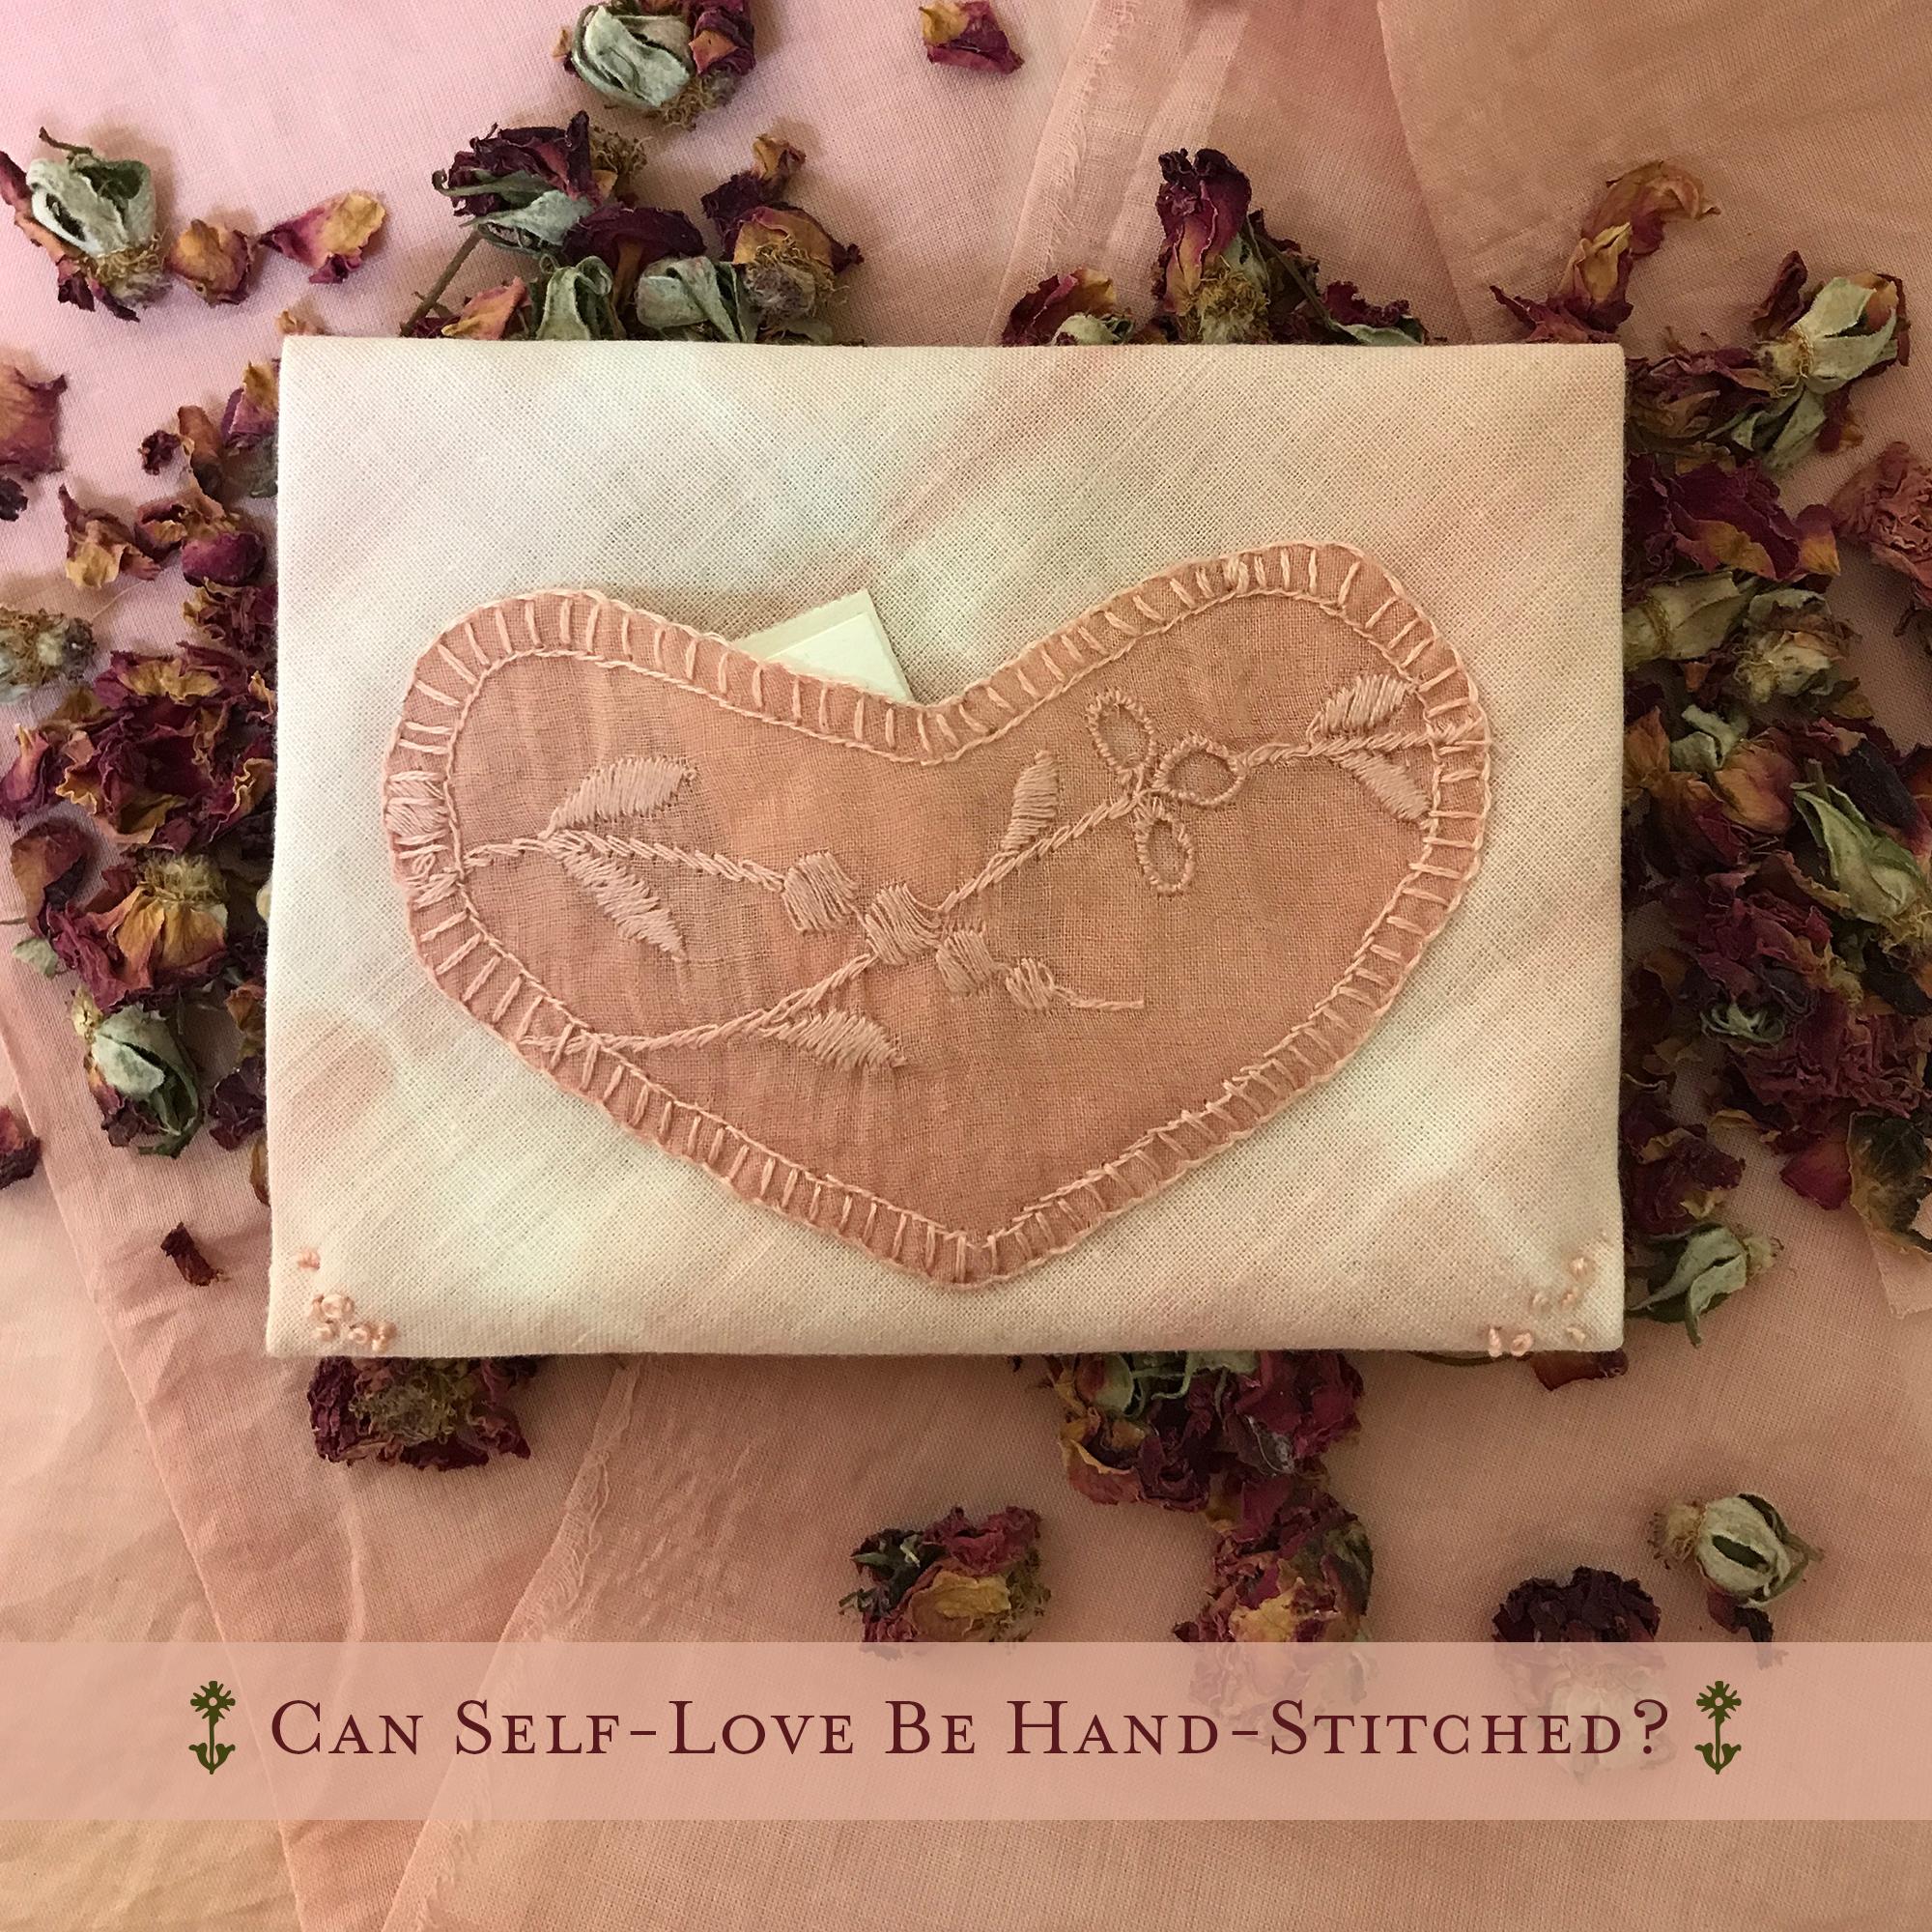 Self-Love-Stitches_social.jpg